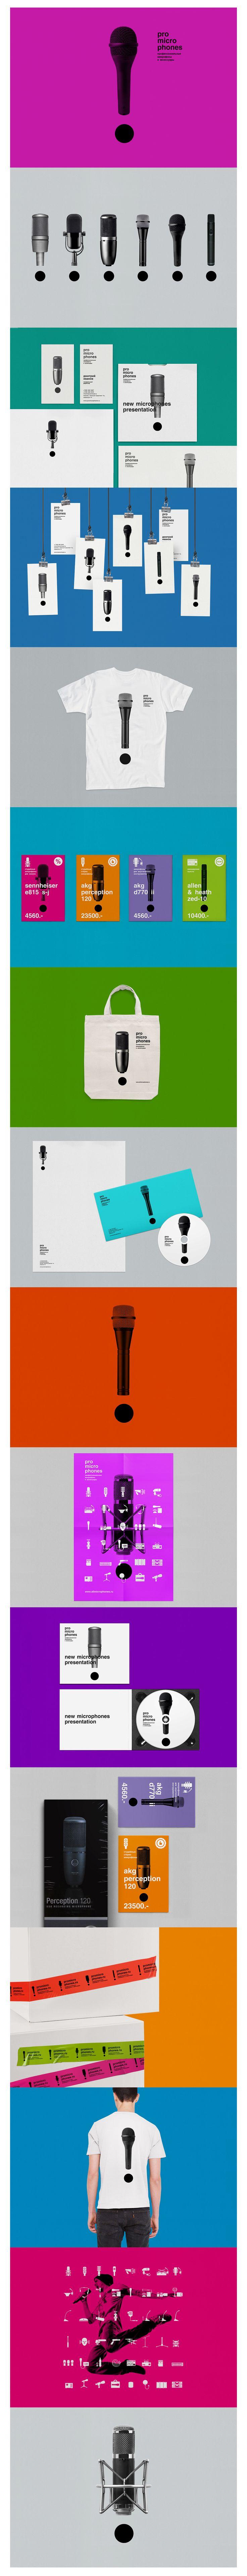 Promicrophones #identity #identity #packaging #branding #marketing PD